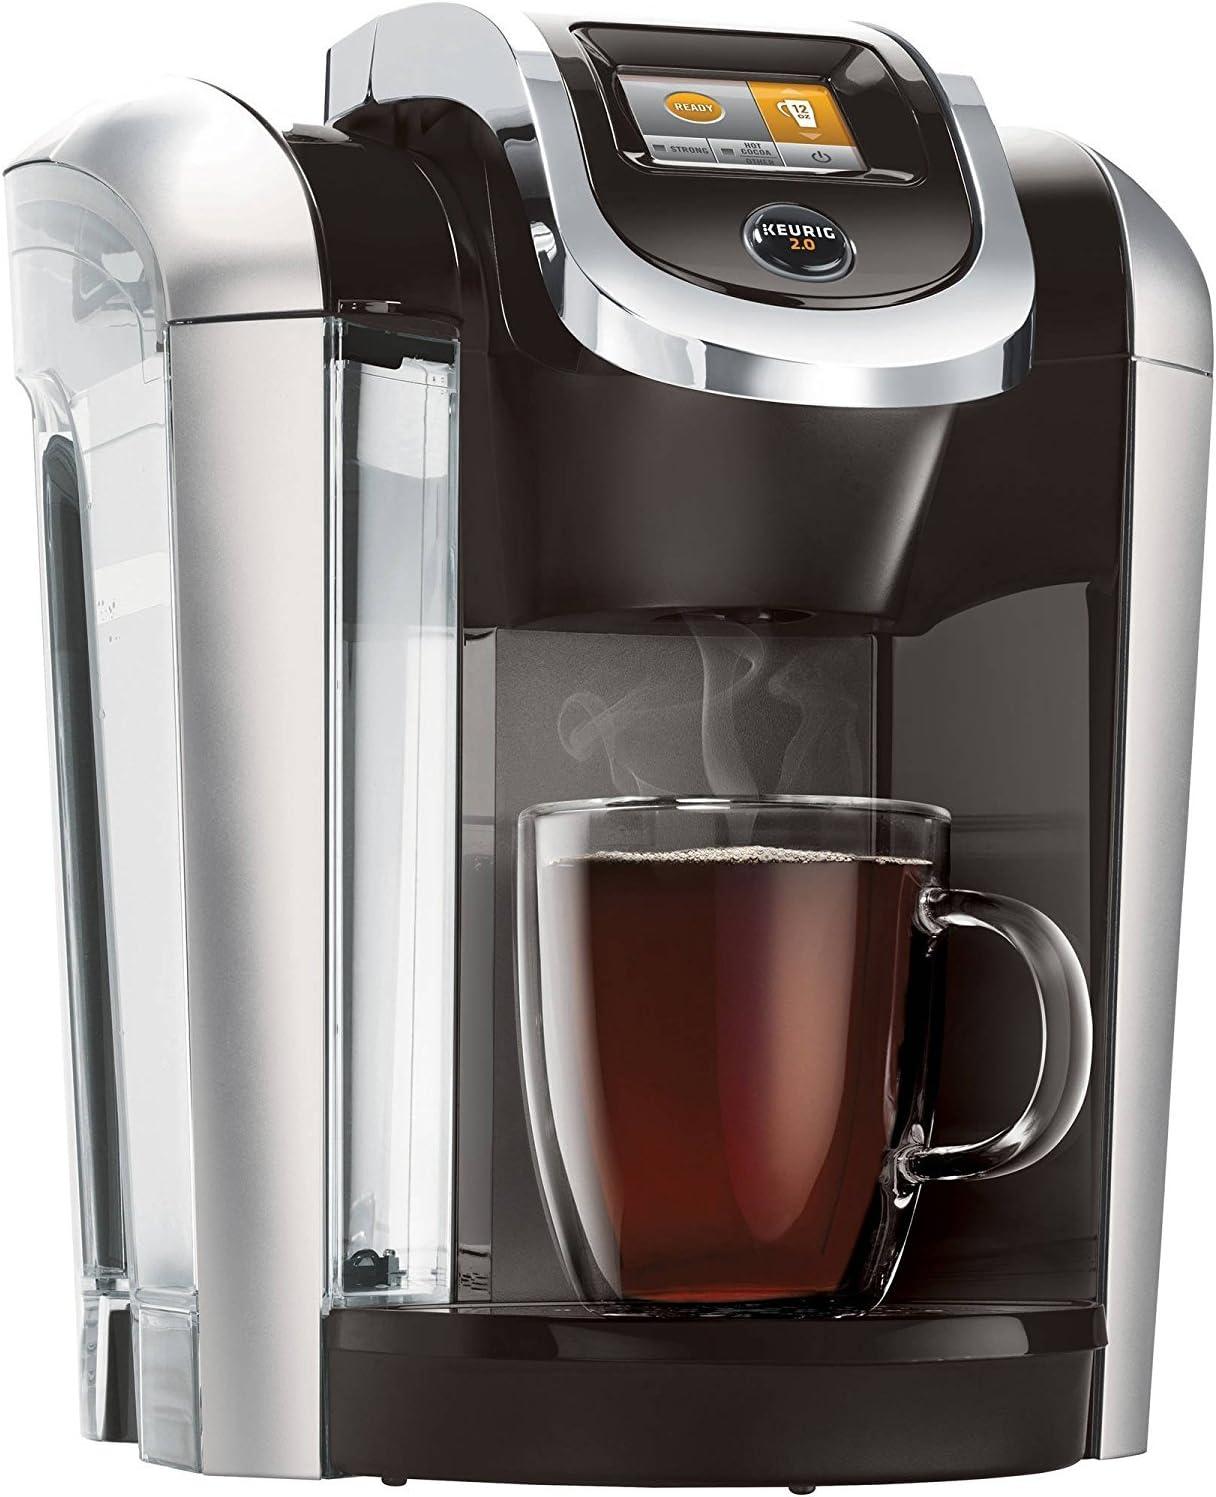 Amazon.com: Keurig, Hot 2.0, K425 Plus Series, cafetera para ...